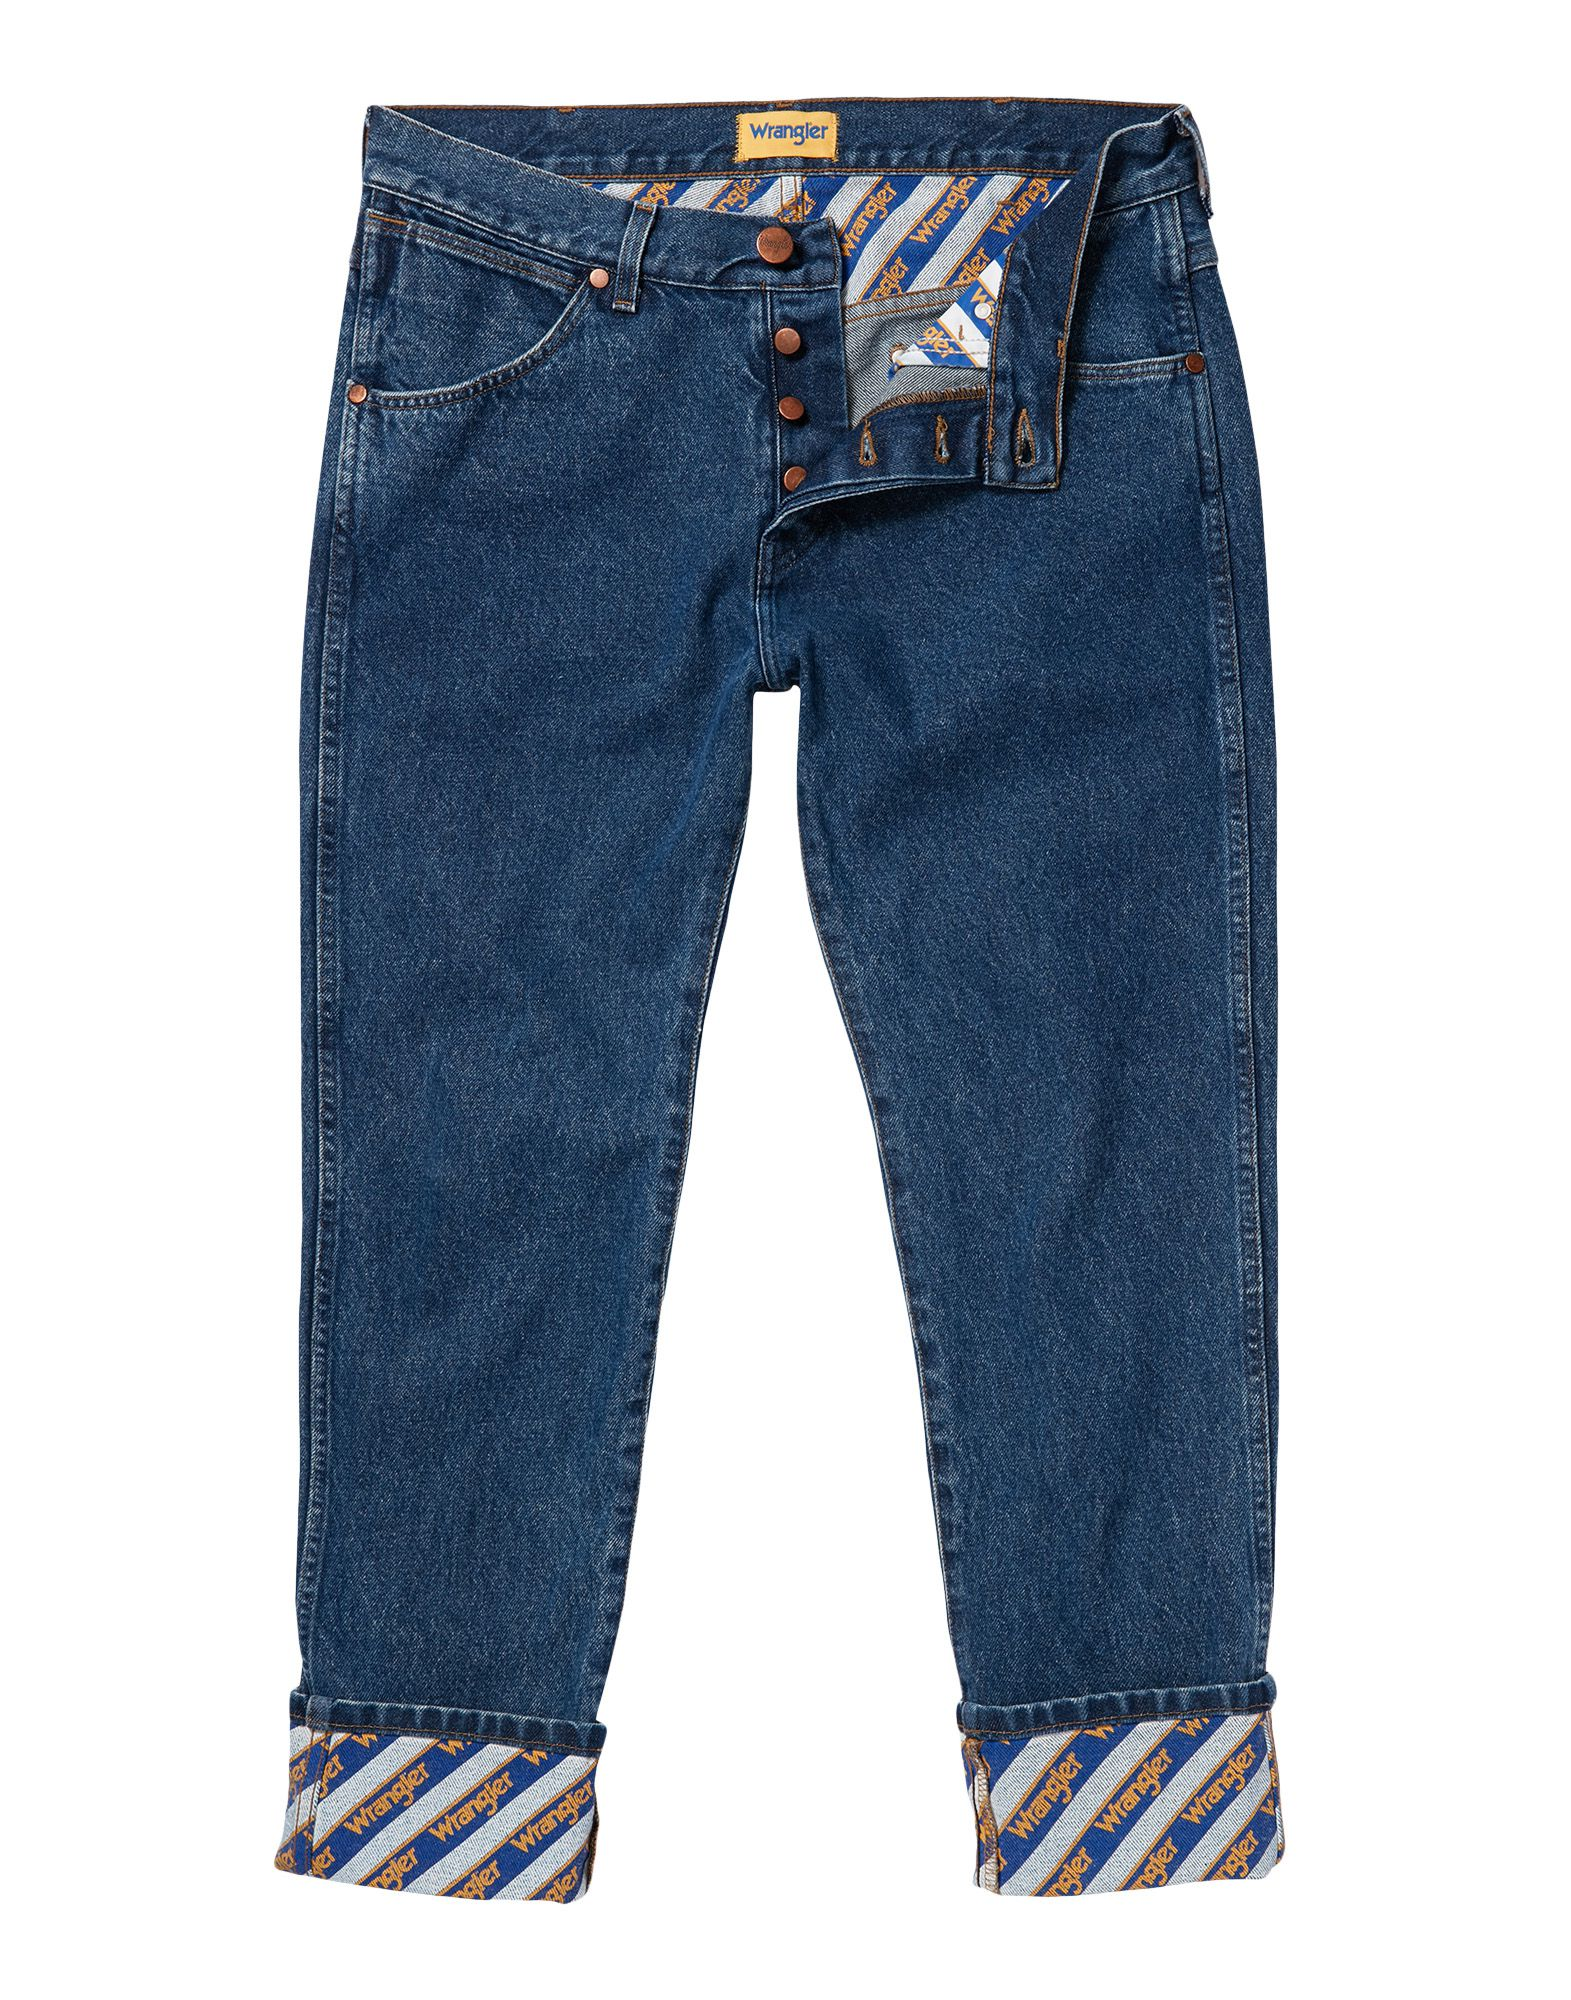 Pantaloni Jeans Wrangler Uomo - Acquista online su